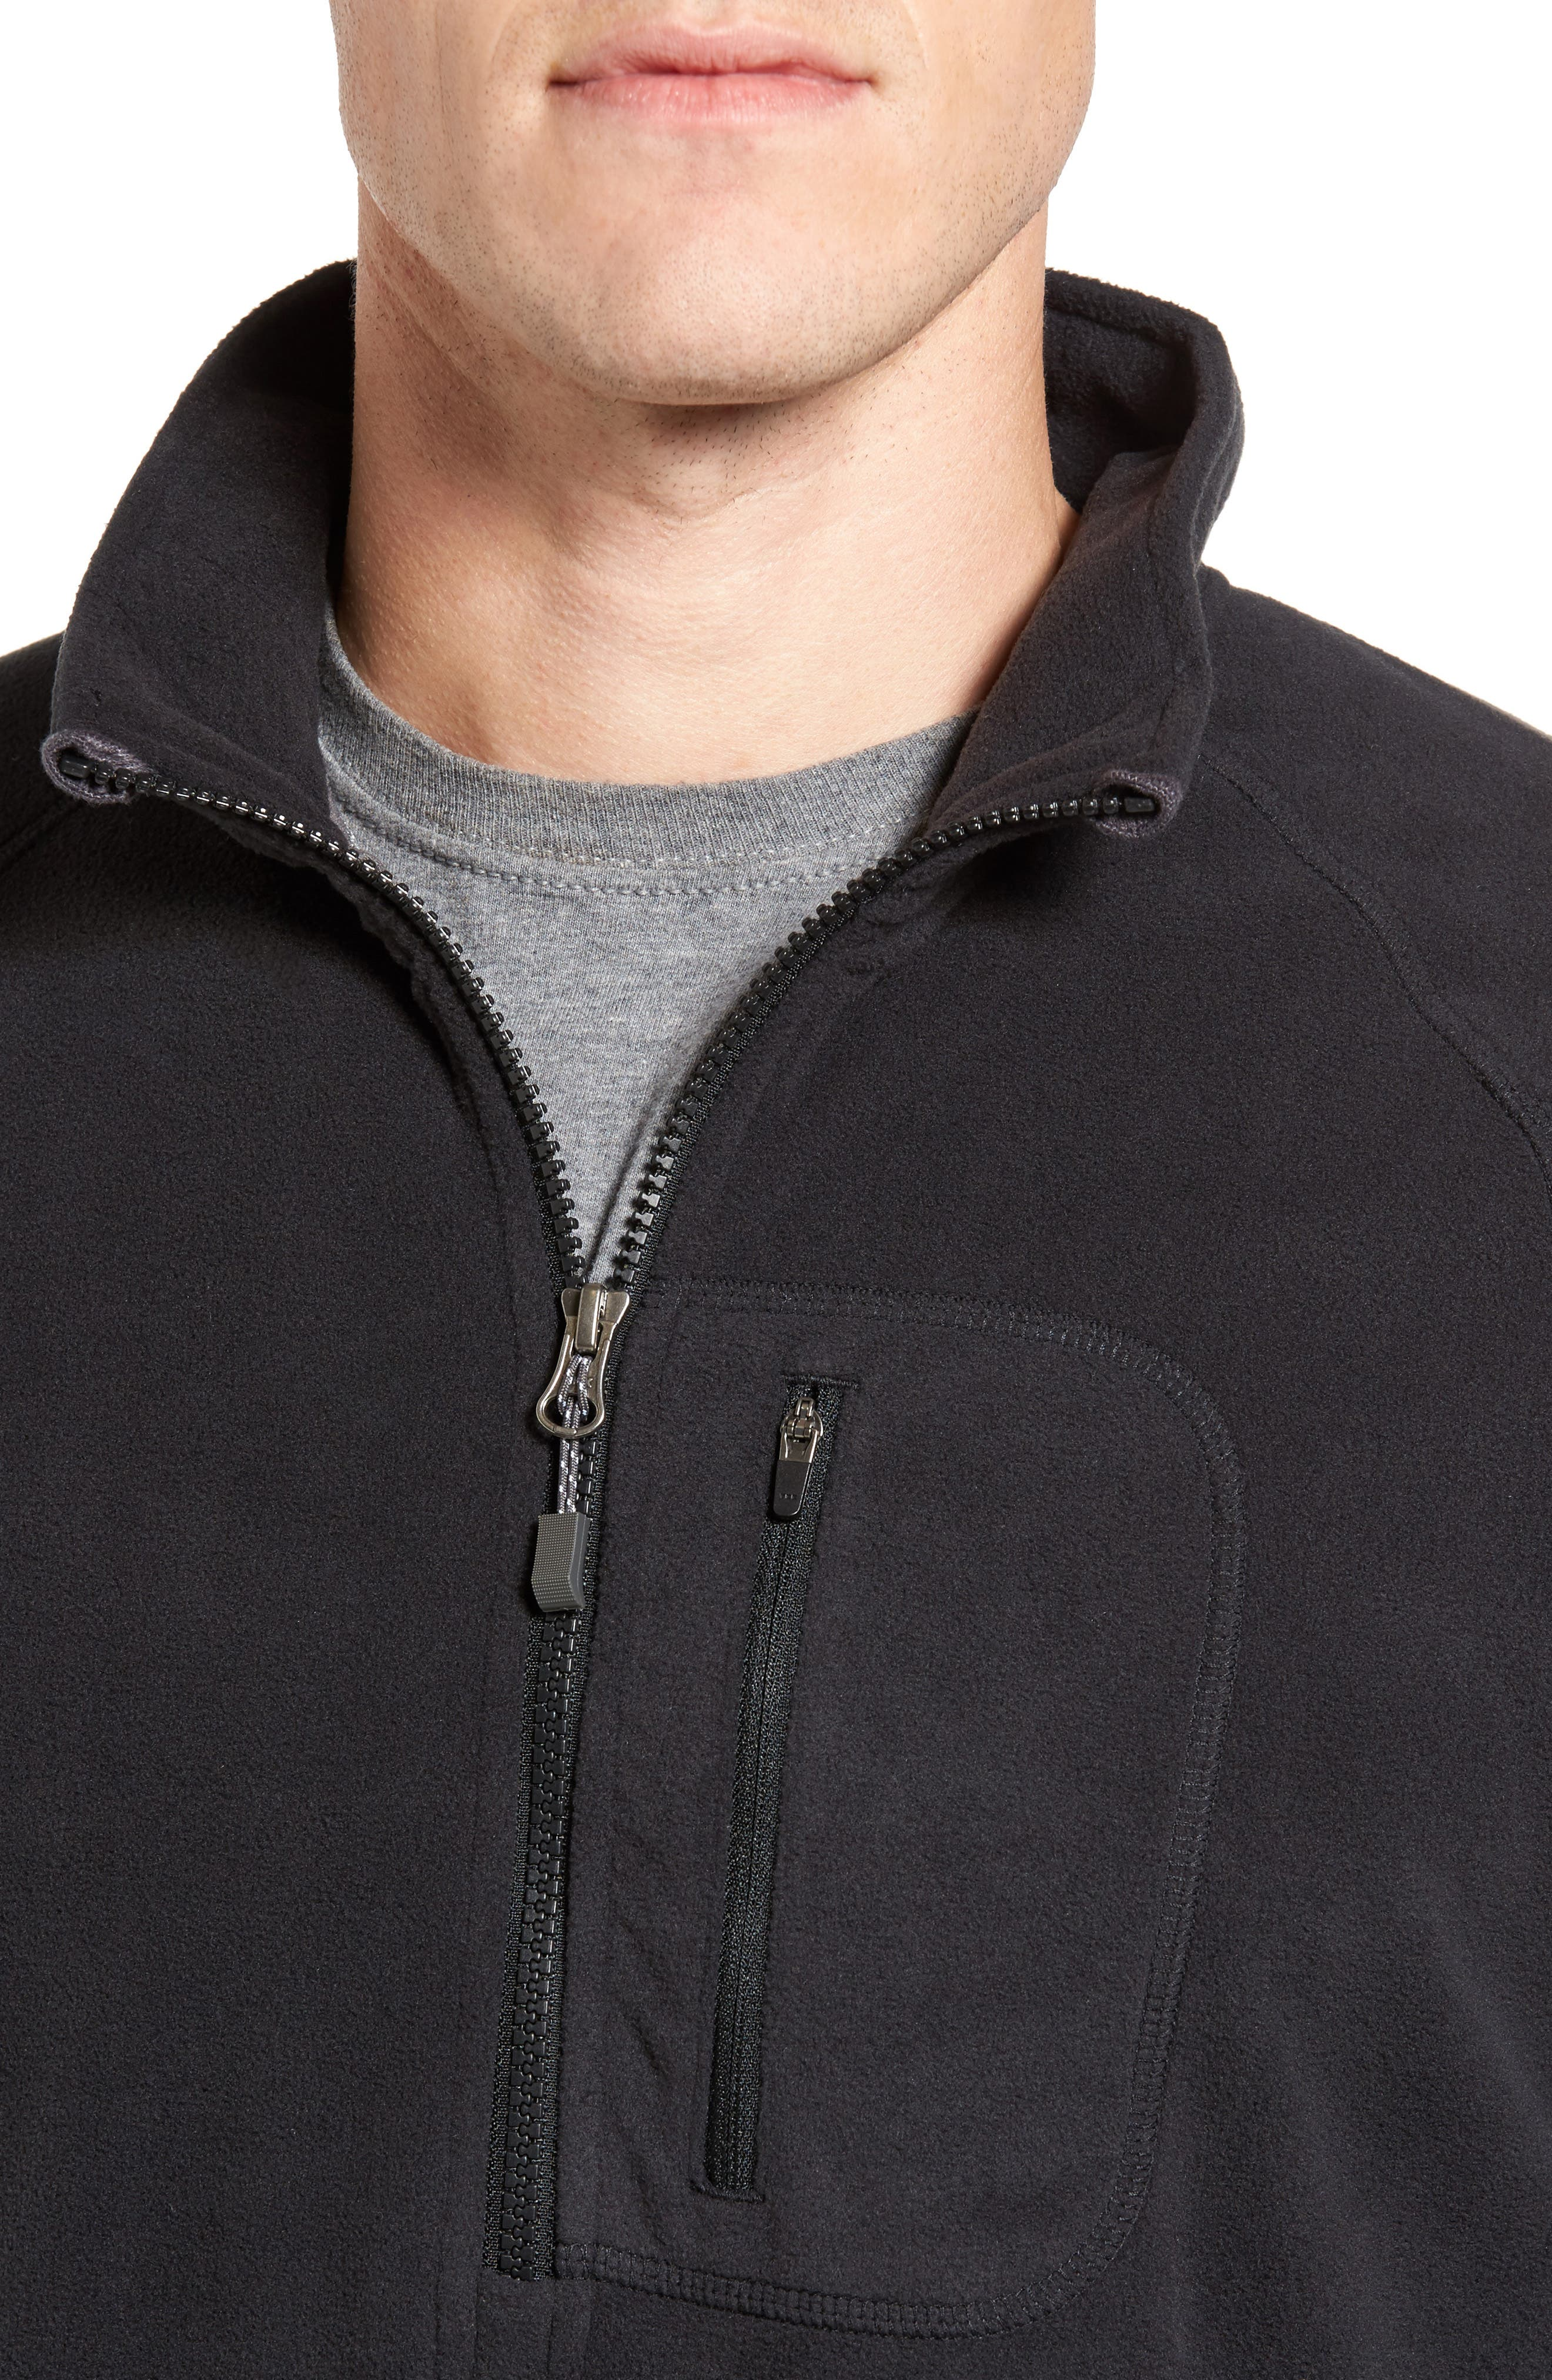 Utility Quarter Zip Fleece Sweater,                             Alternate thumbnail 4, color,                             002